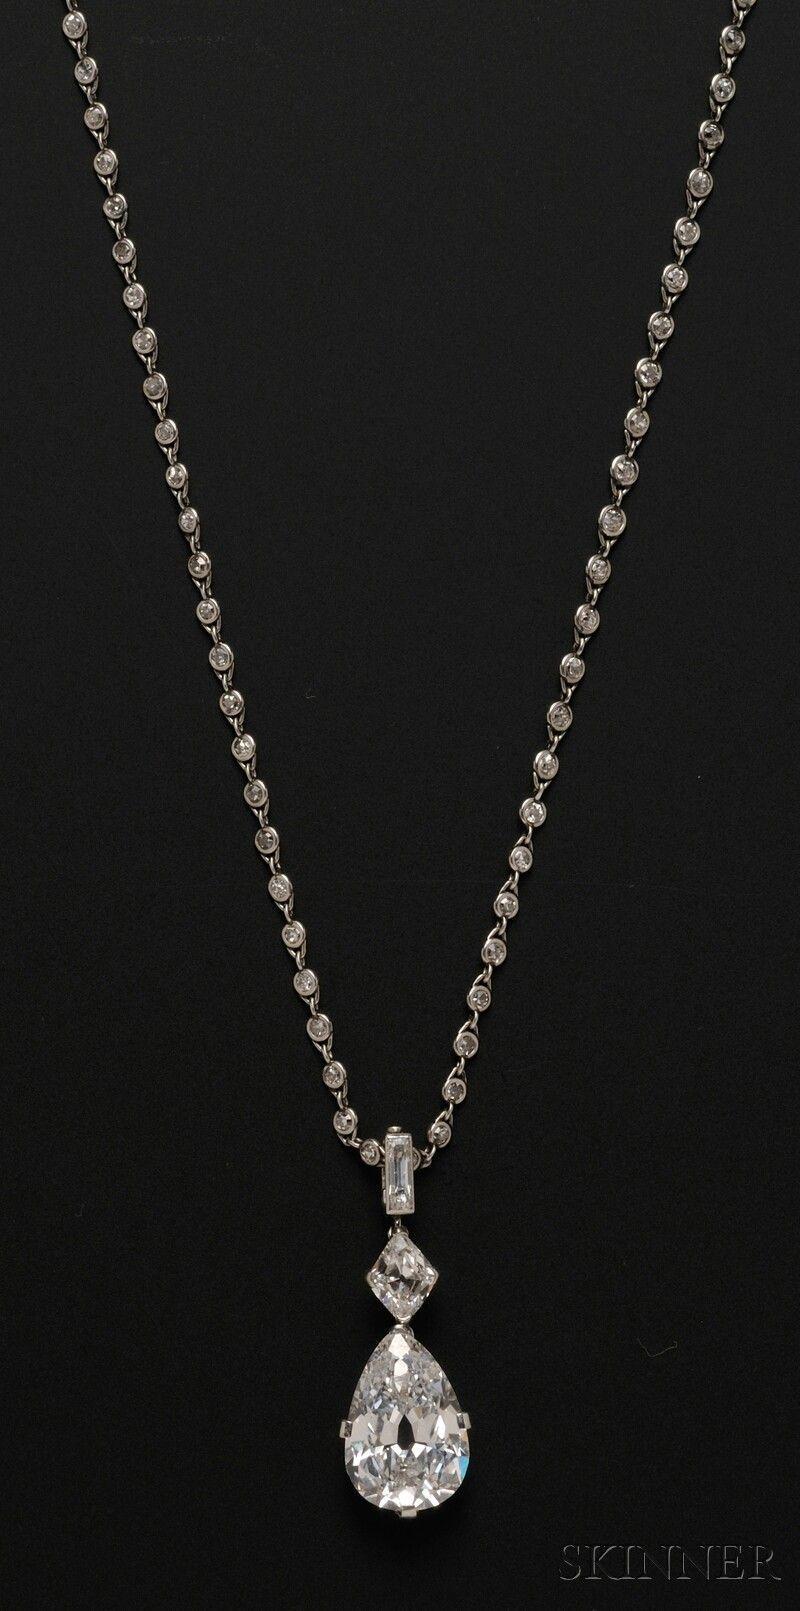 Cartier diamond necklace to die forne jewelry sale 2601b lot cartier diamond necklace to die forne jewelry sale 2601b lot 580 aloadofball Images